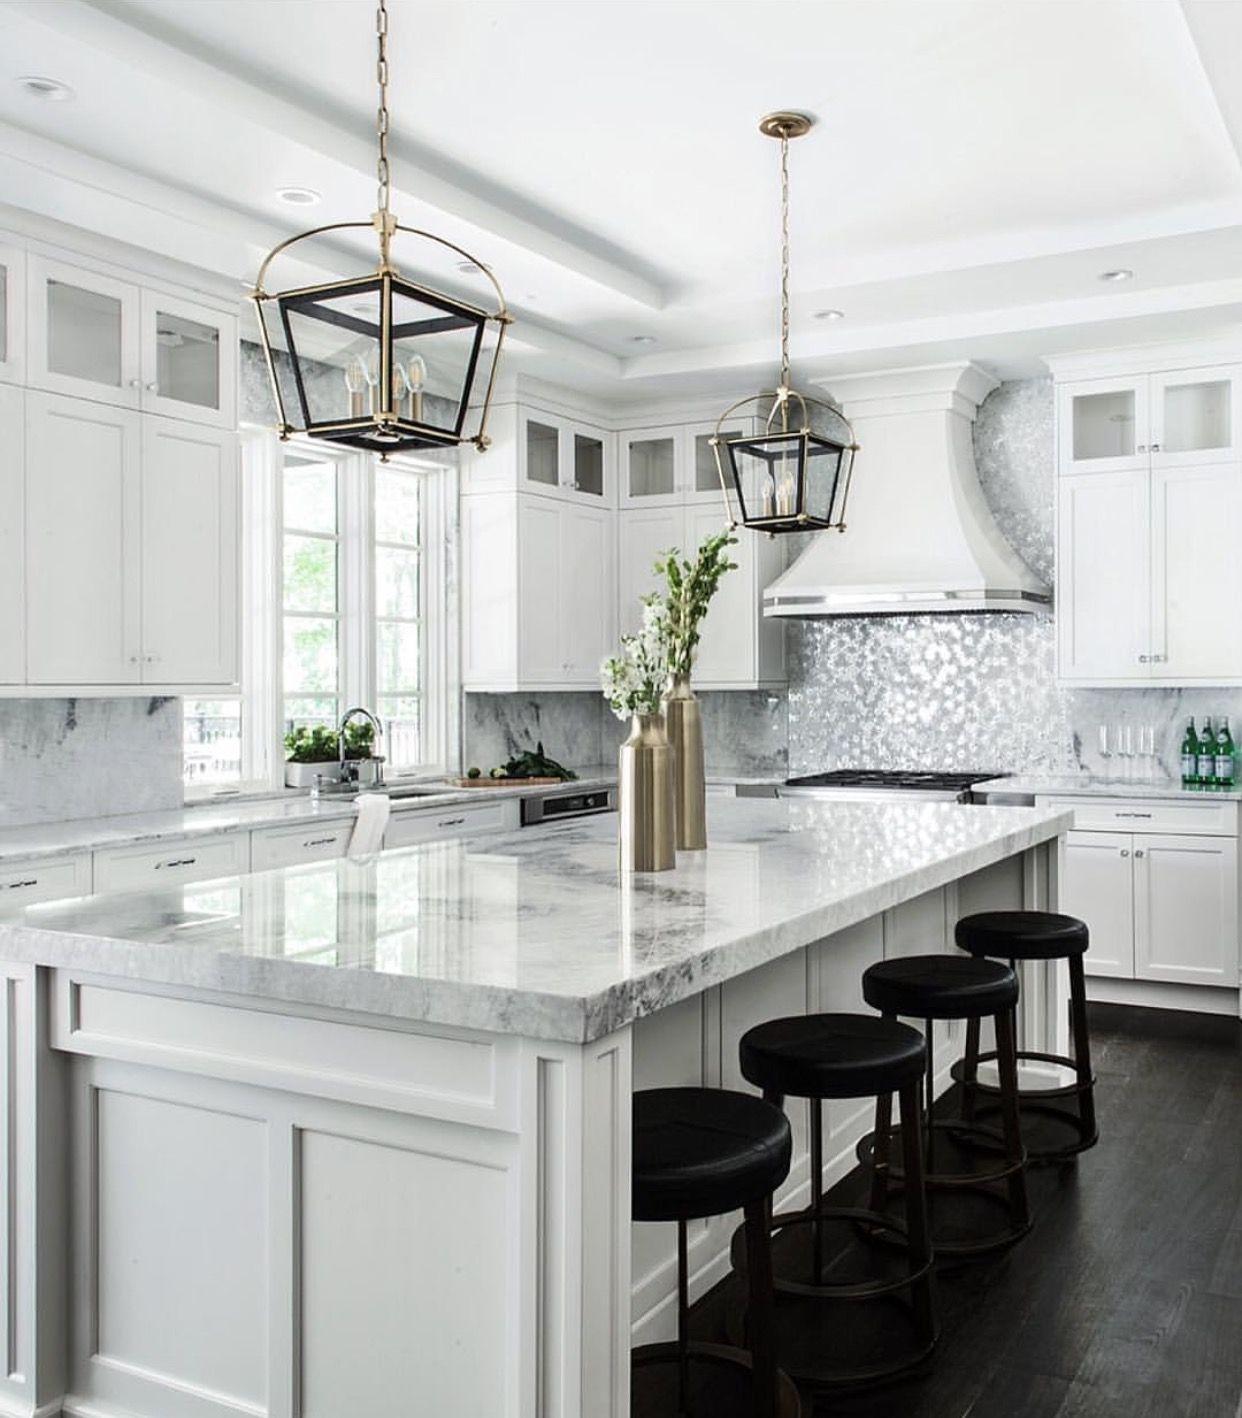 Black Bar Stools With All White Kitchen White Kitchen Design Kitchen Cabinets Decor Kitchen Inspirations